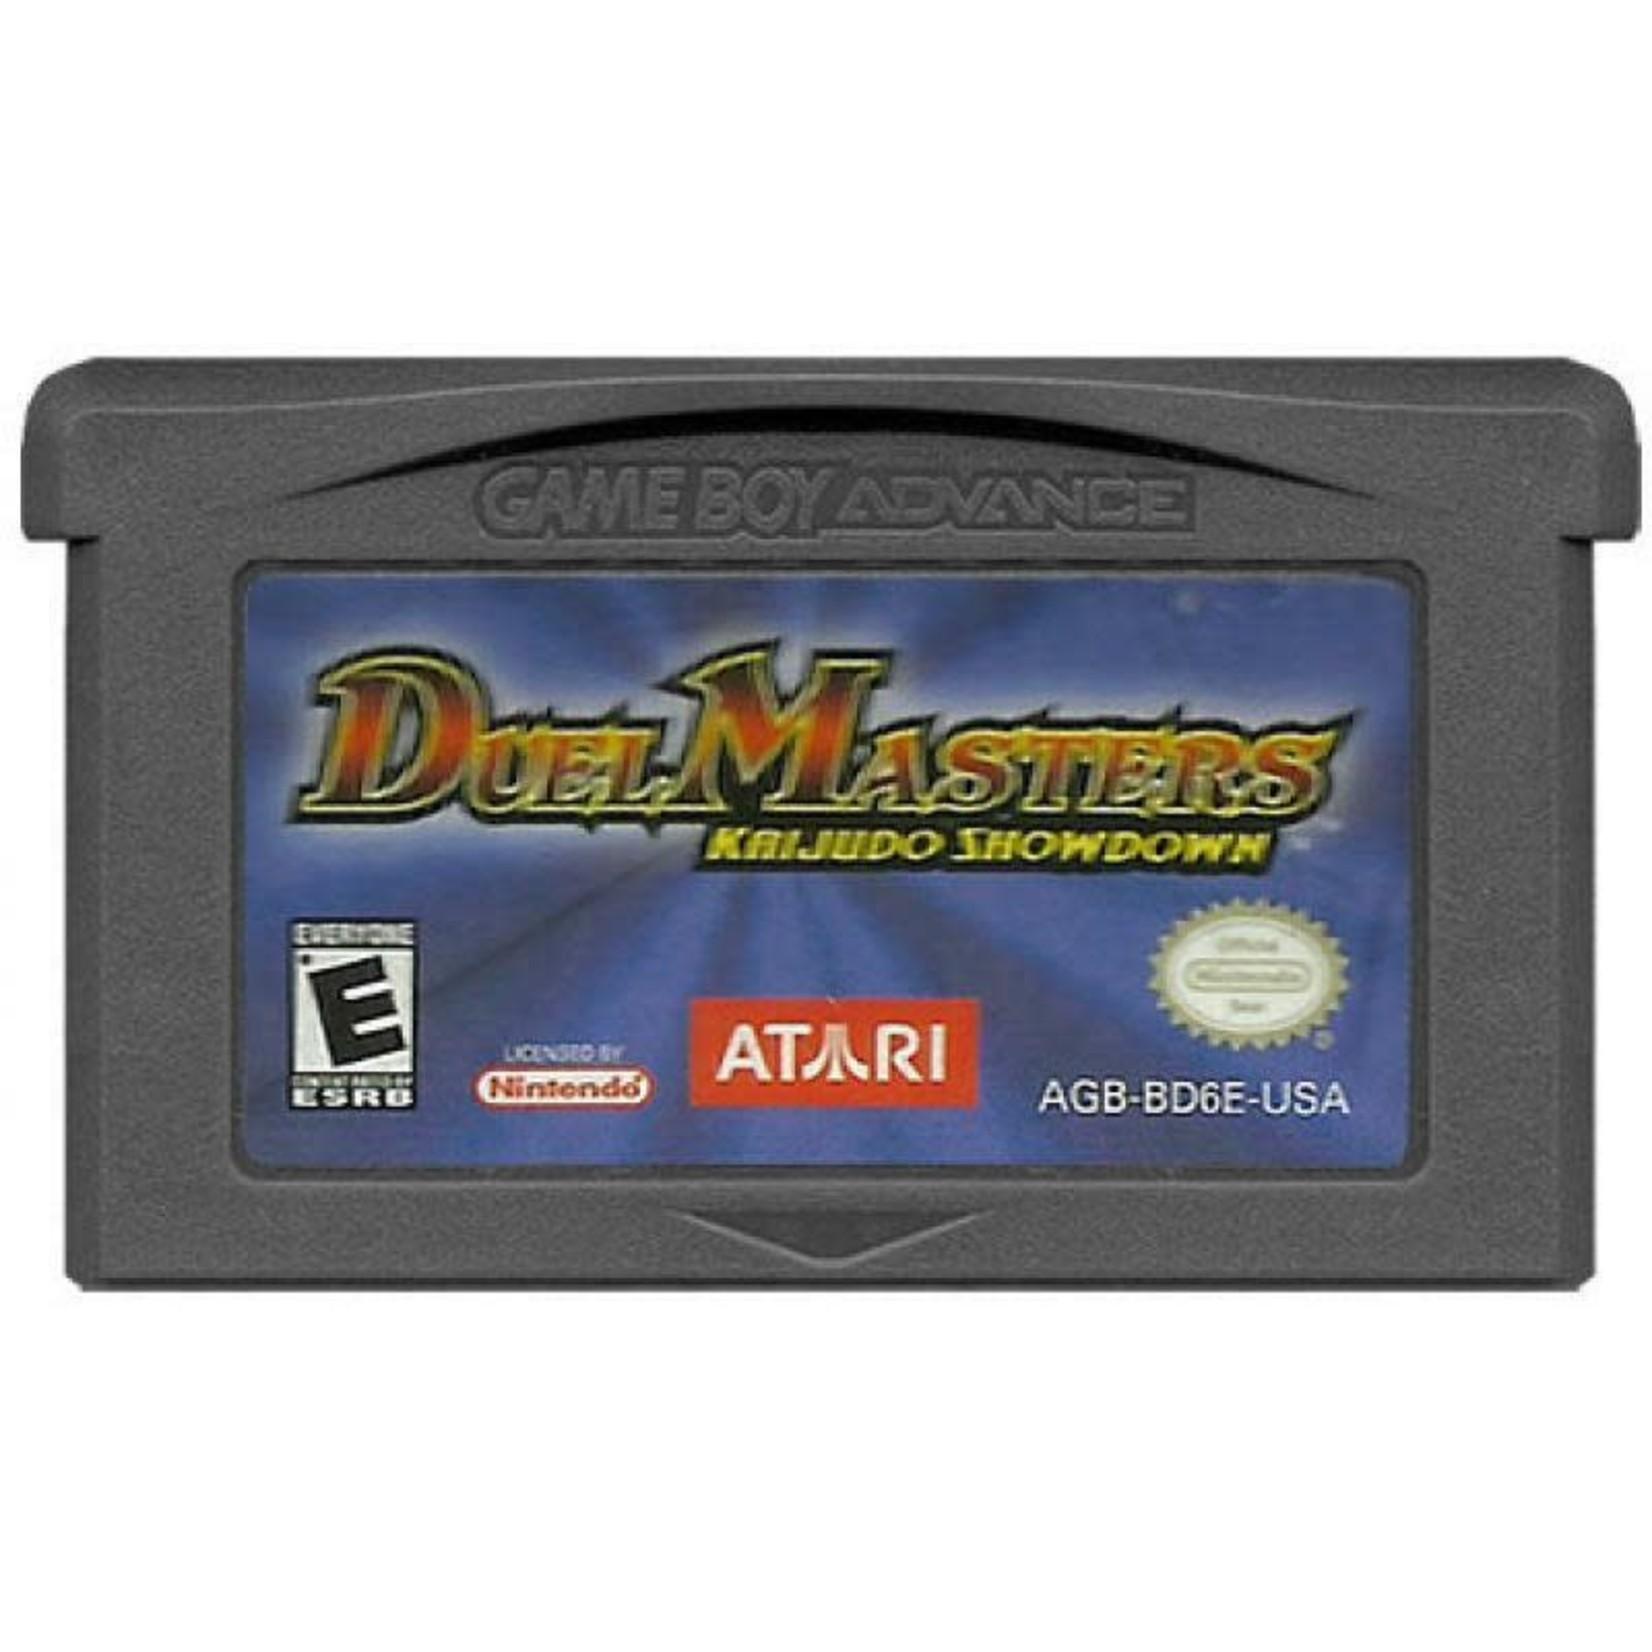 GBAU-Duel Masters Kaijudo Showdown (cartridge)